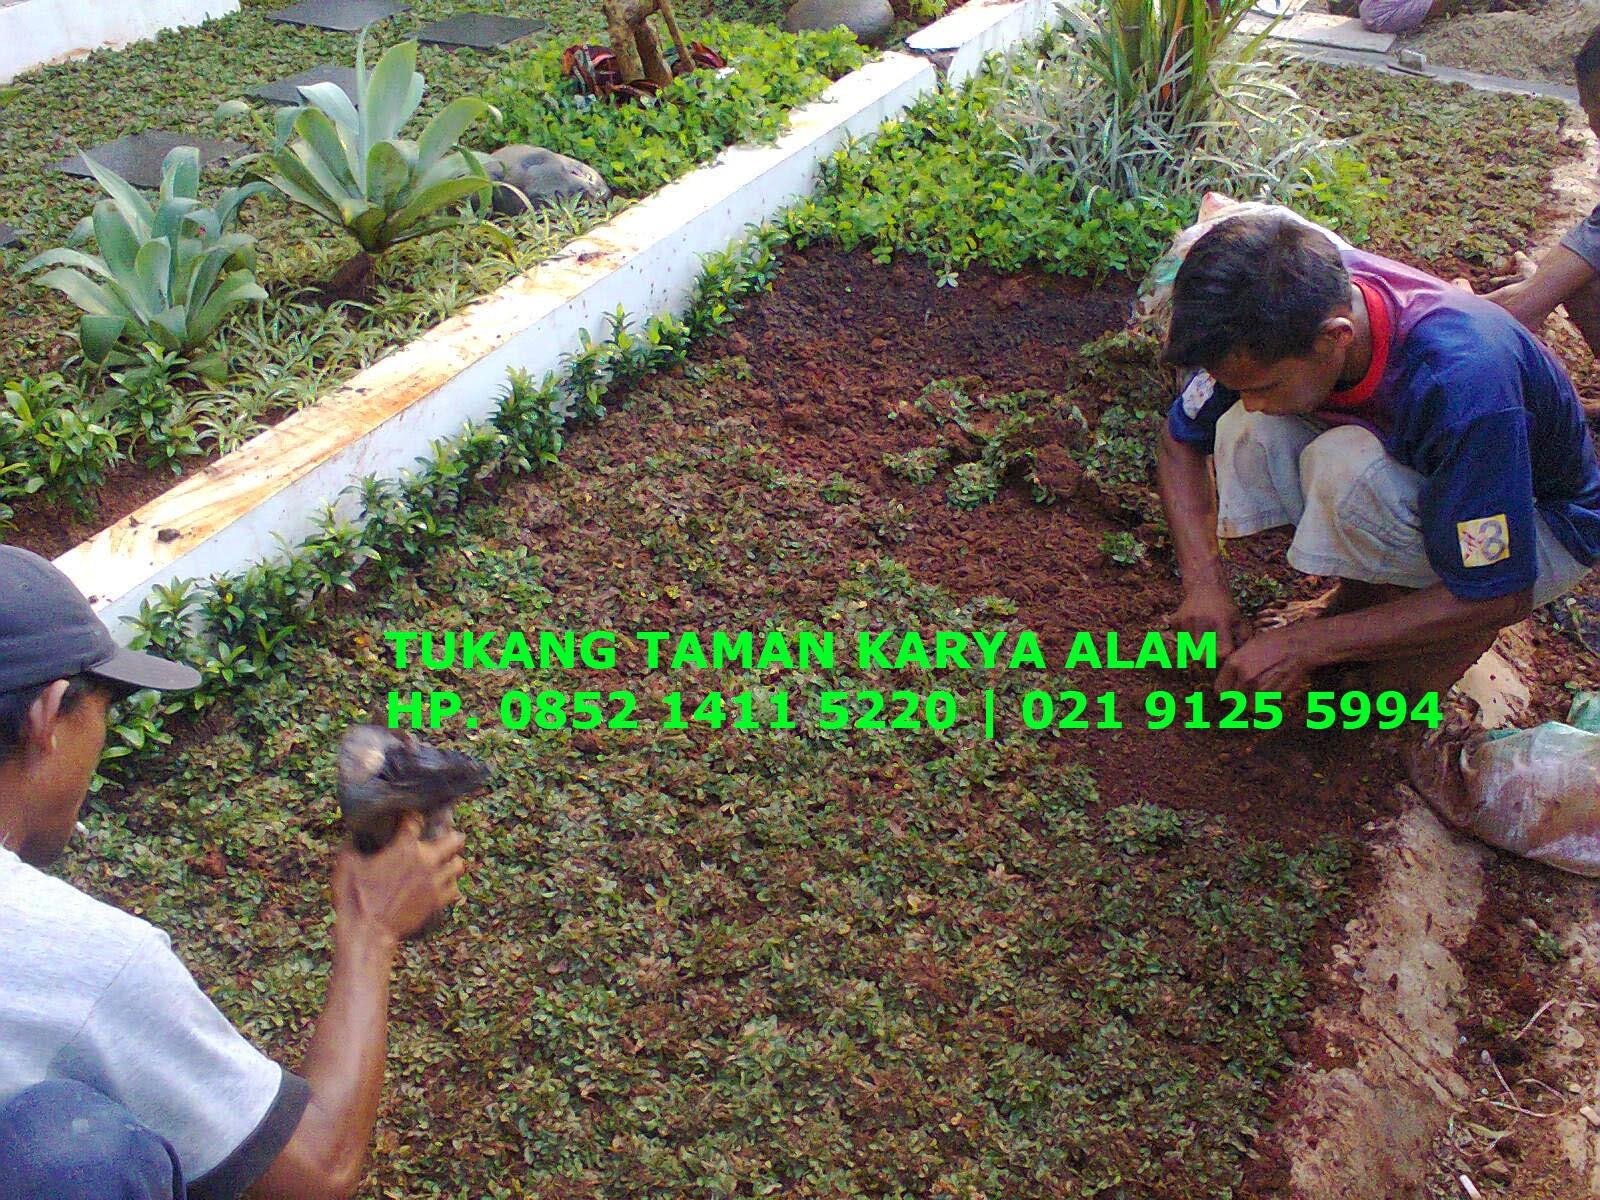 http://tukangtamankaryaalam.blogspot.com/2014/10/tukang-taman-jasa-pembuatan-renovasi-taman.html